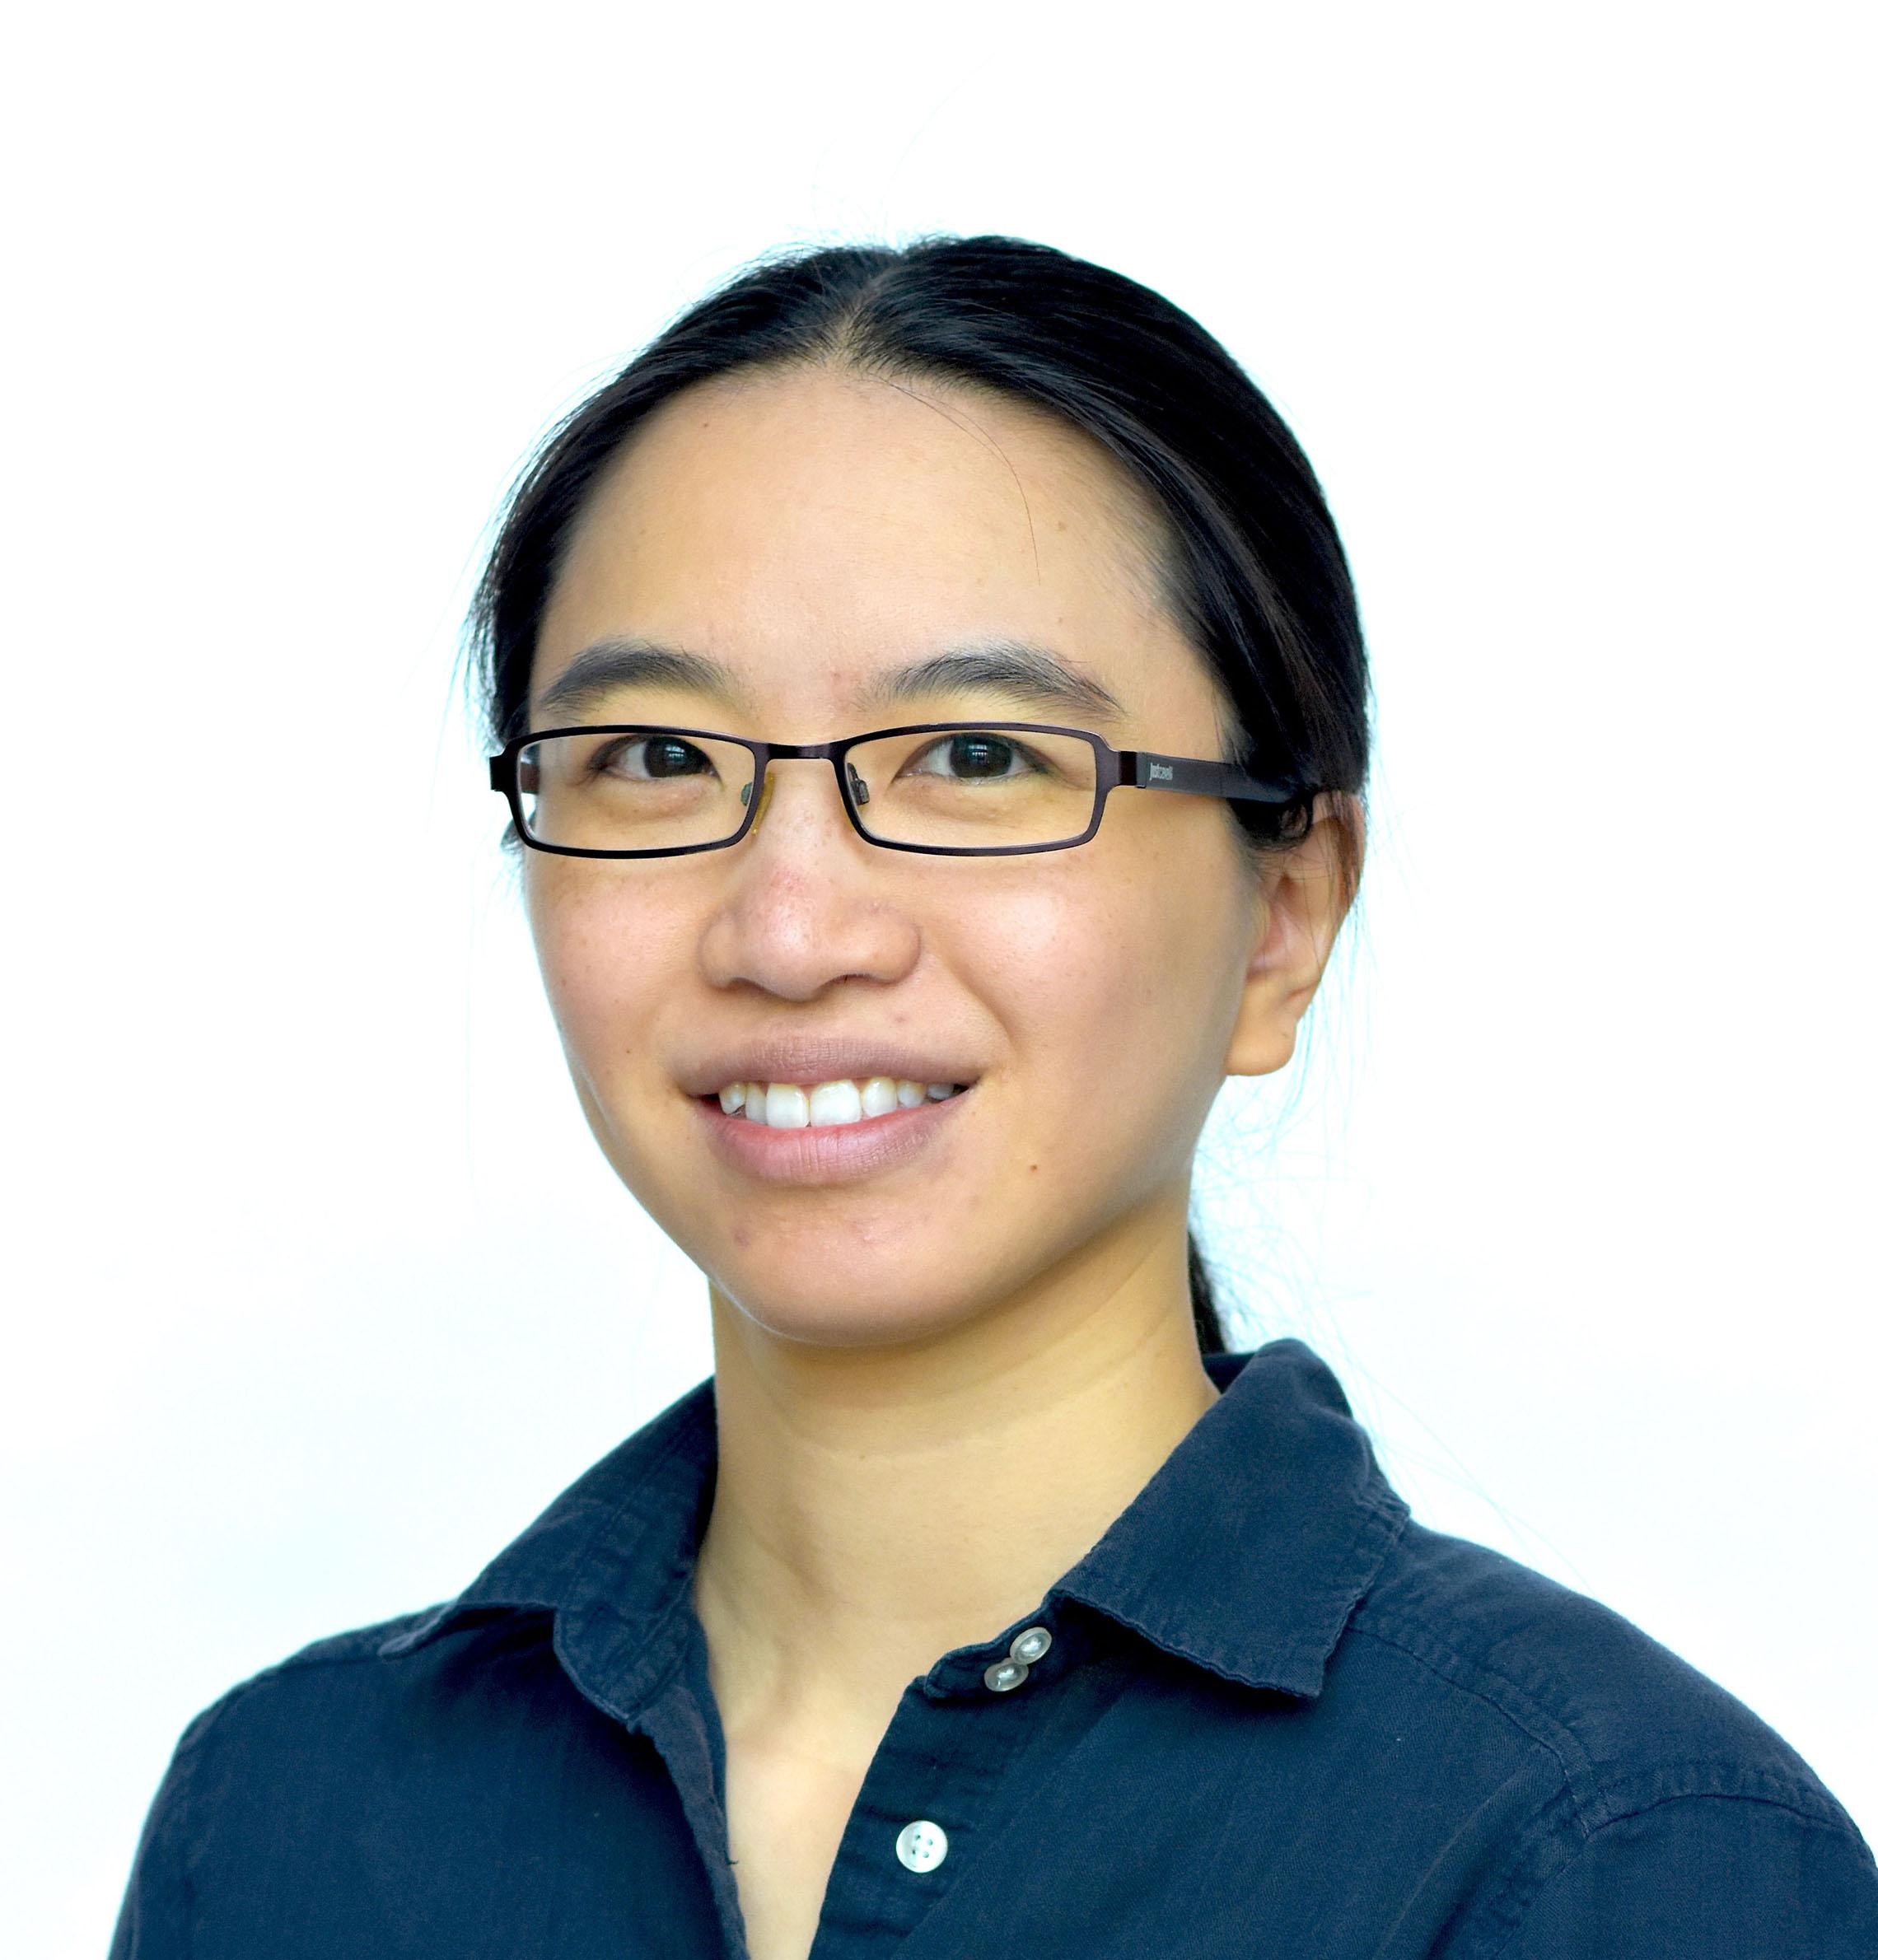 Pui Ying Lam, PhD - Postdoctoral Fellow - Randall T. Peterson Lab